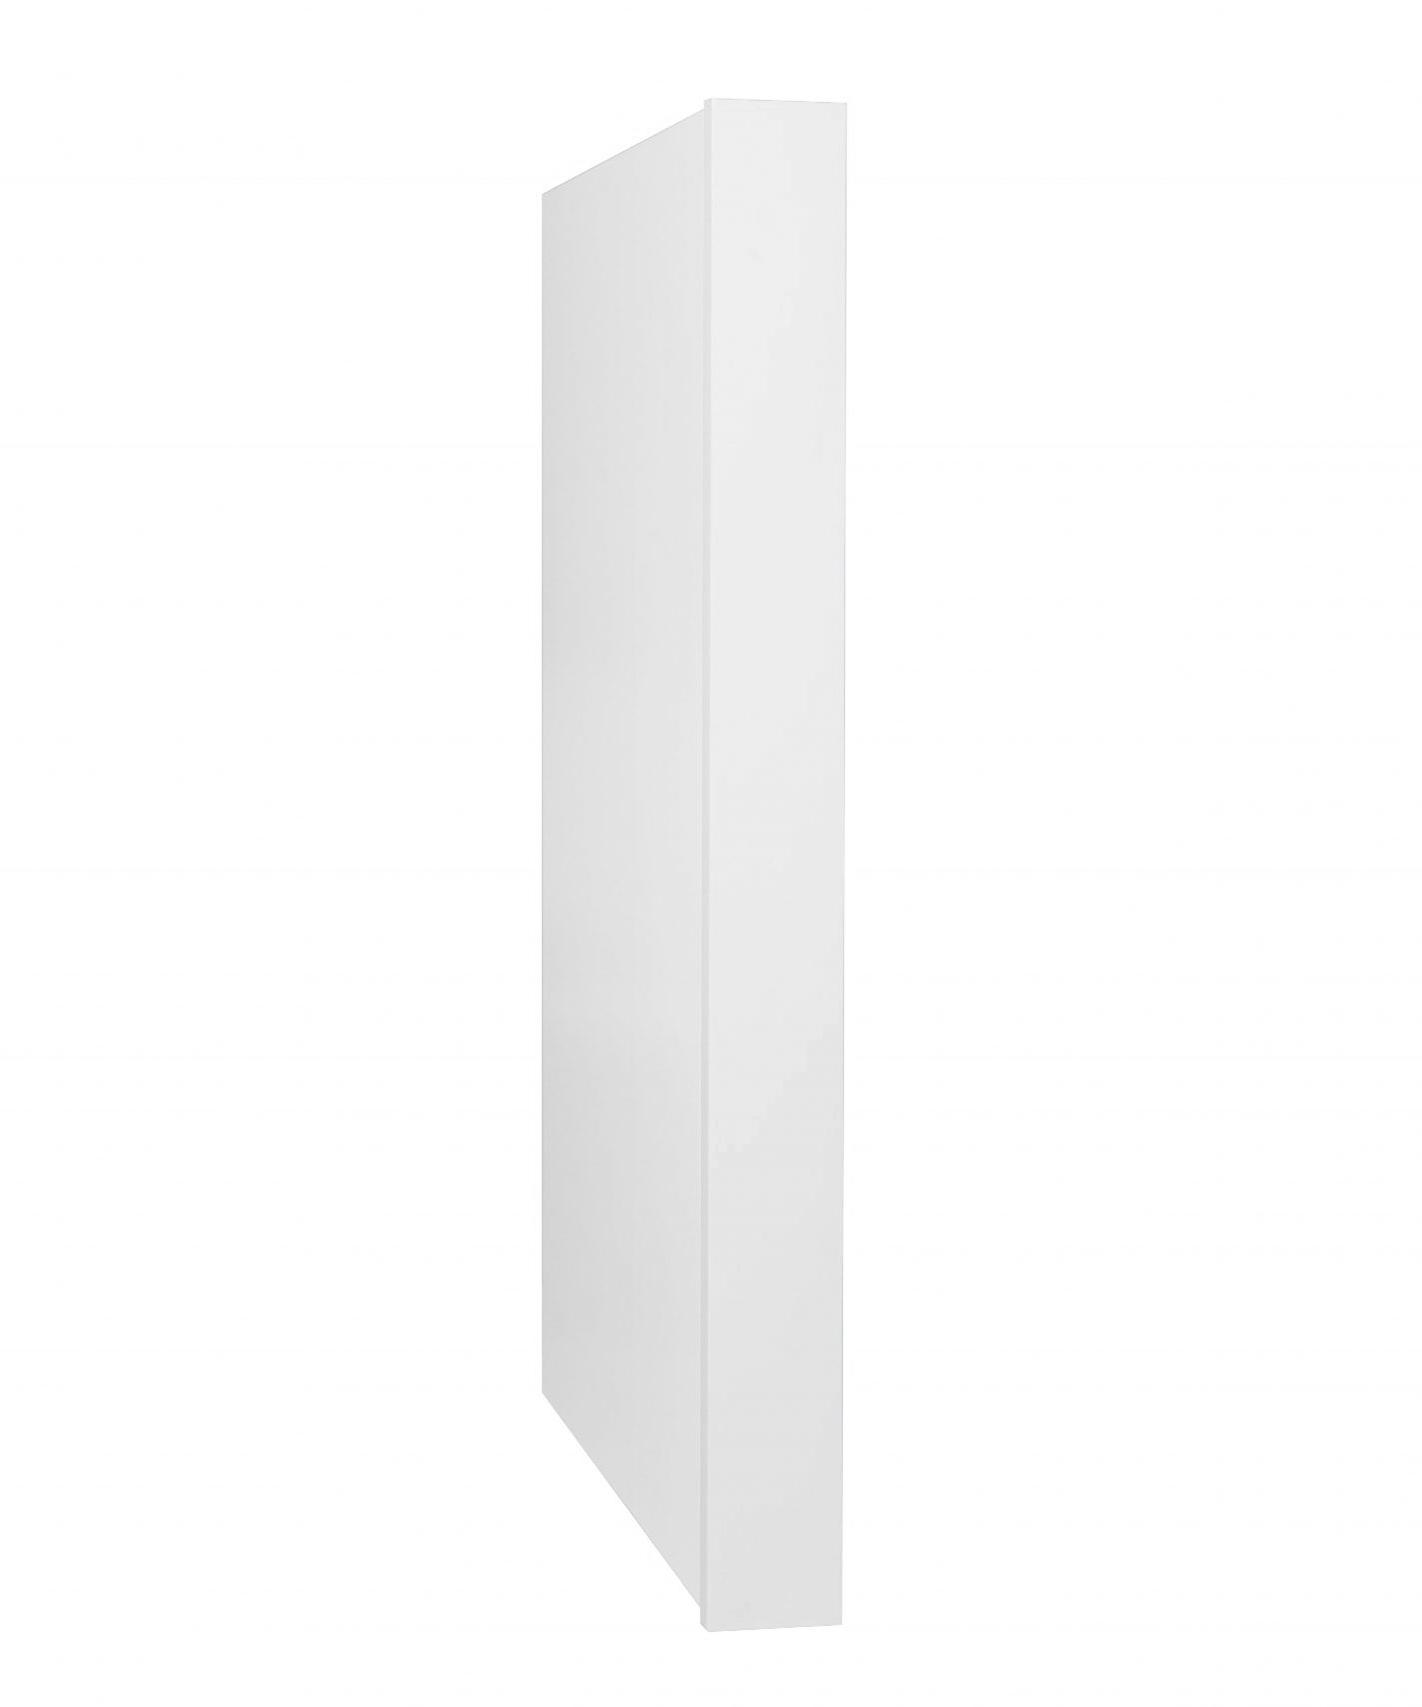 White Shaker Cabinetry DWP